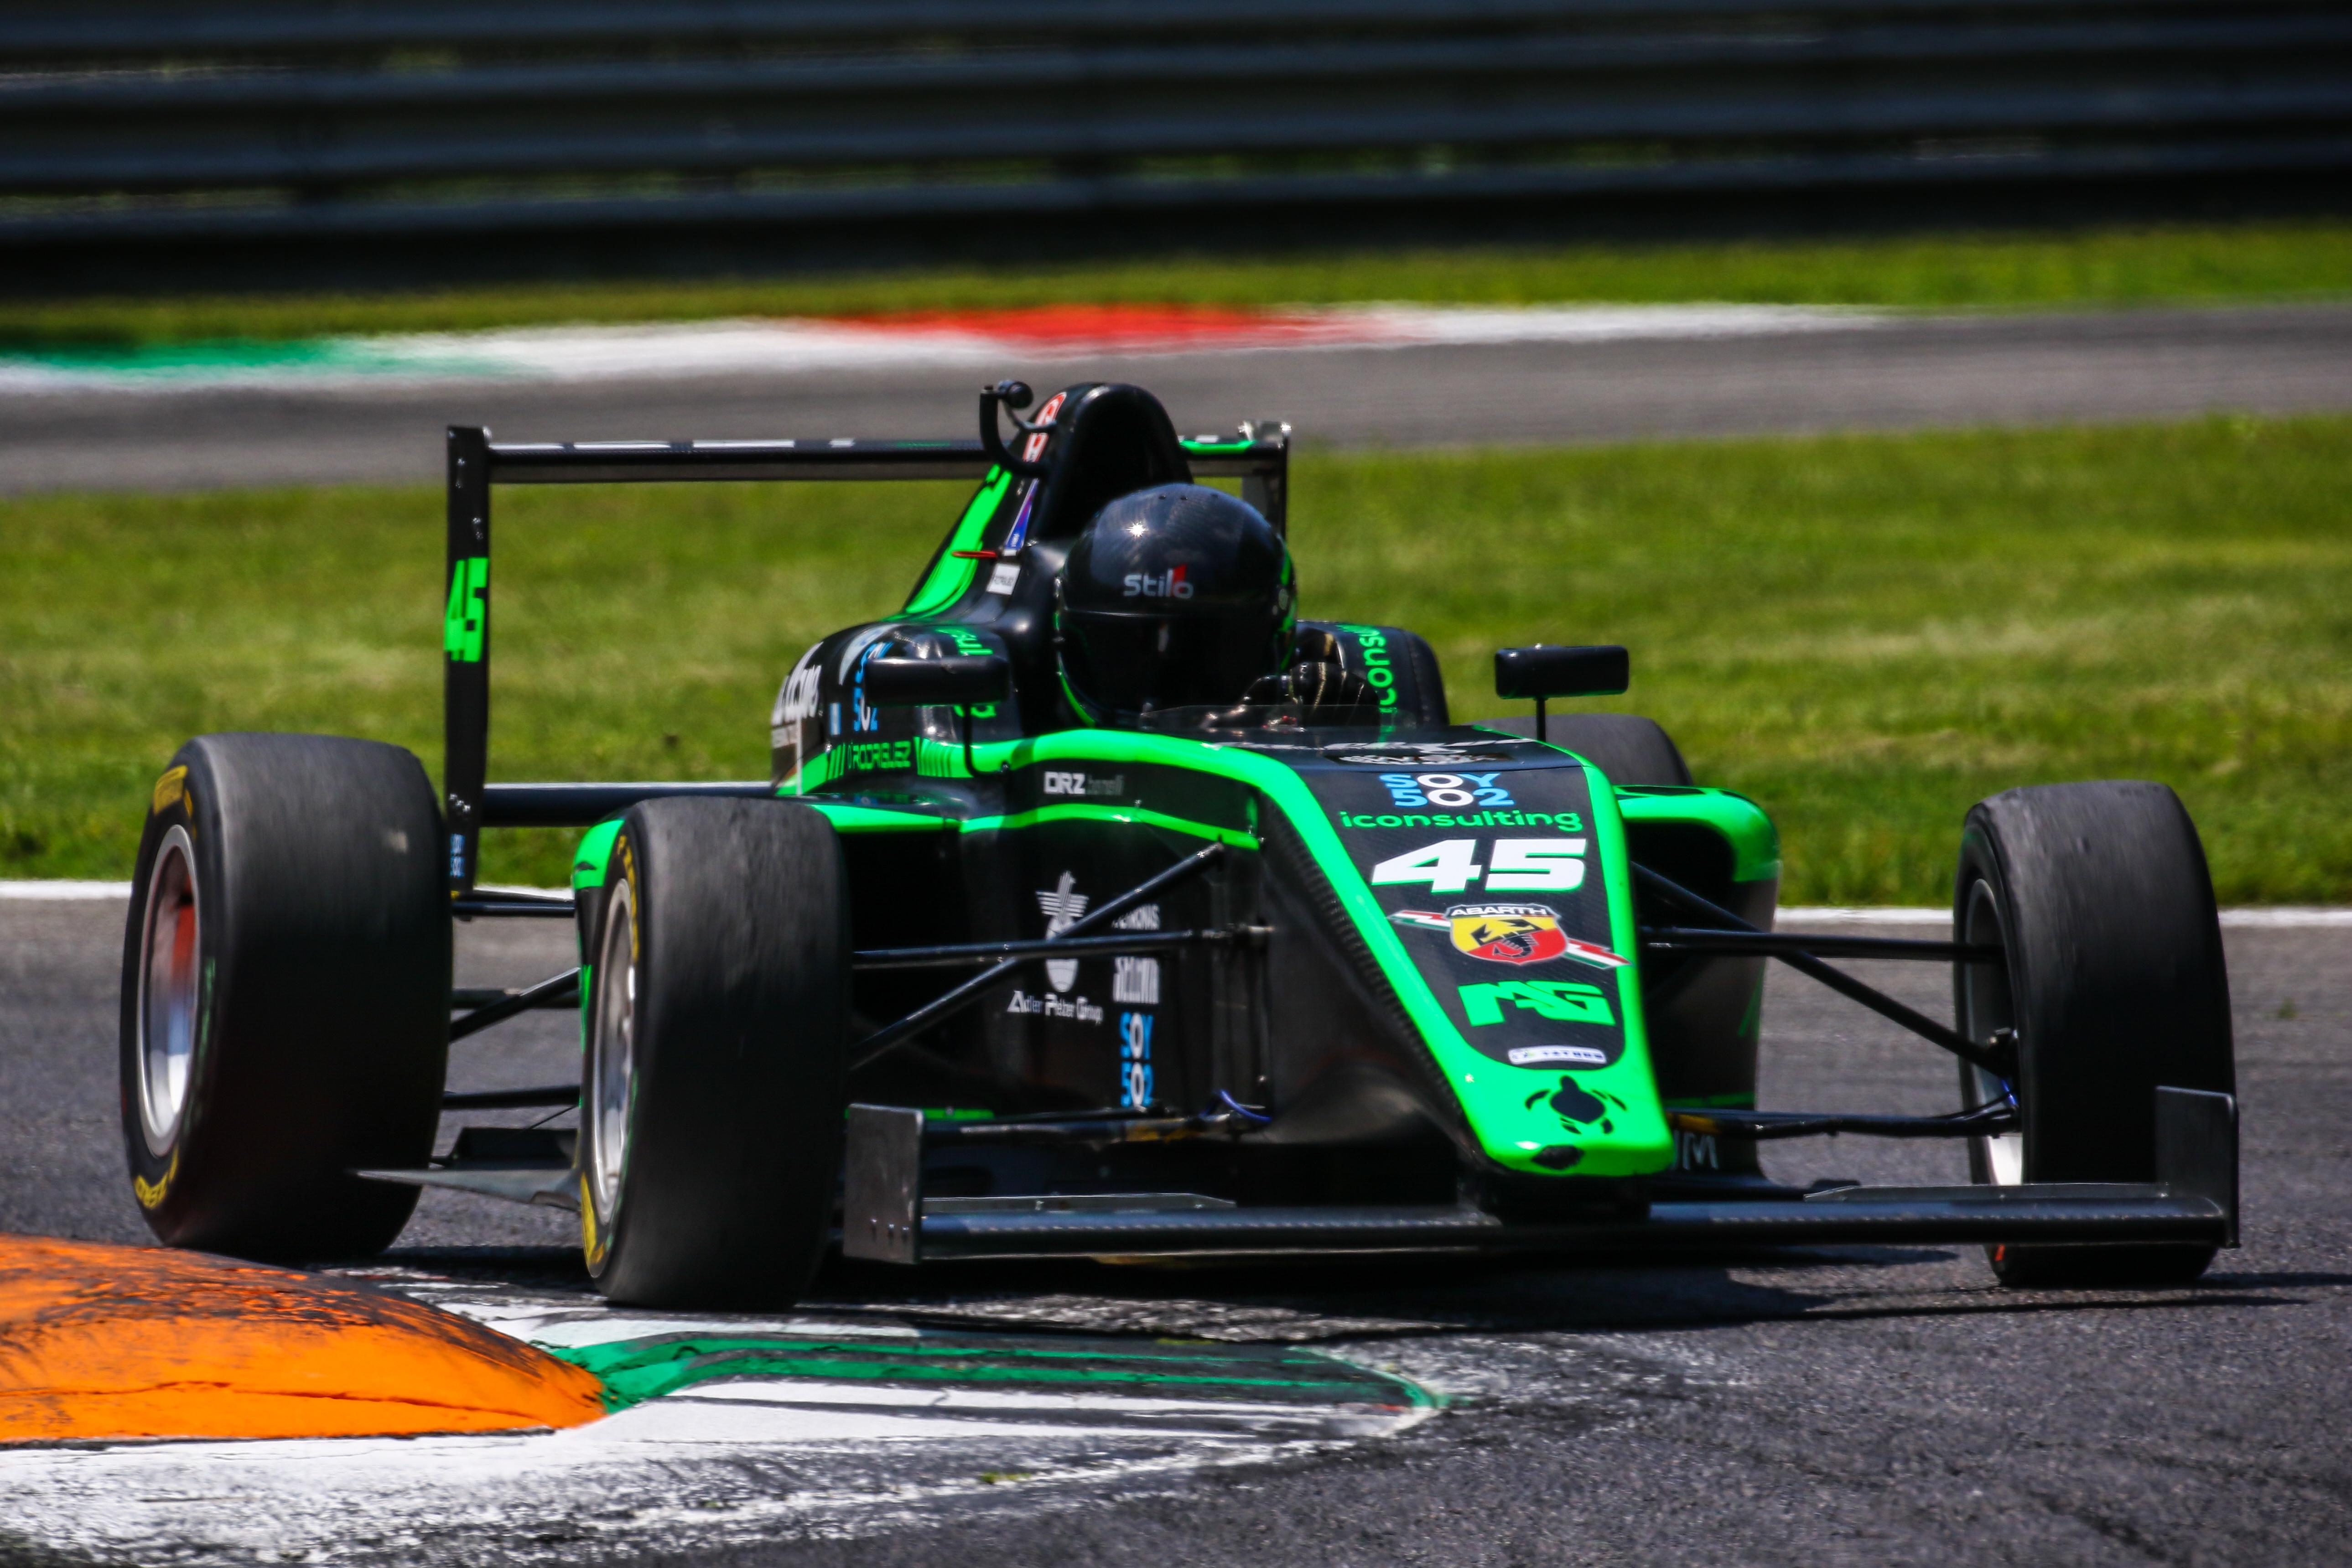 Ian Rodriguez, DRZ, Monza 2018-3048